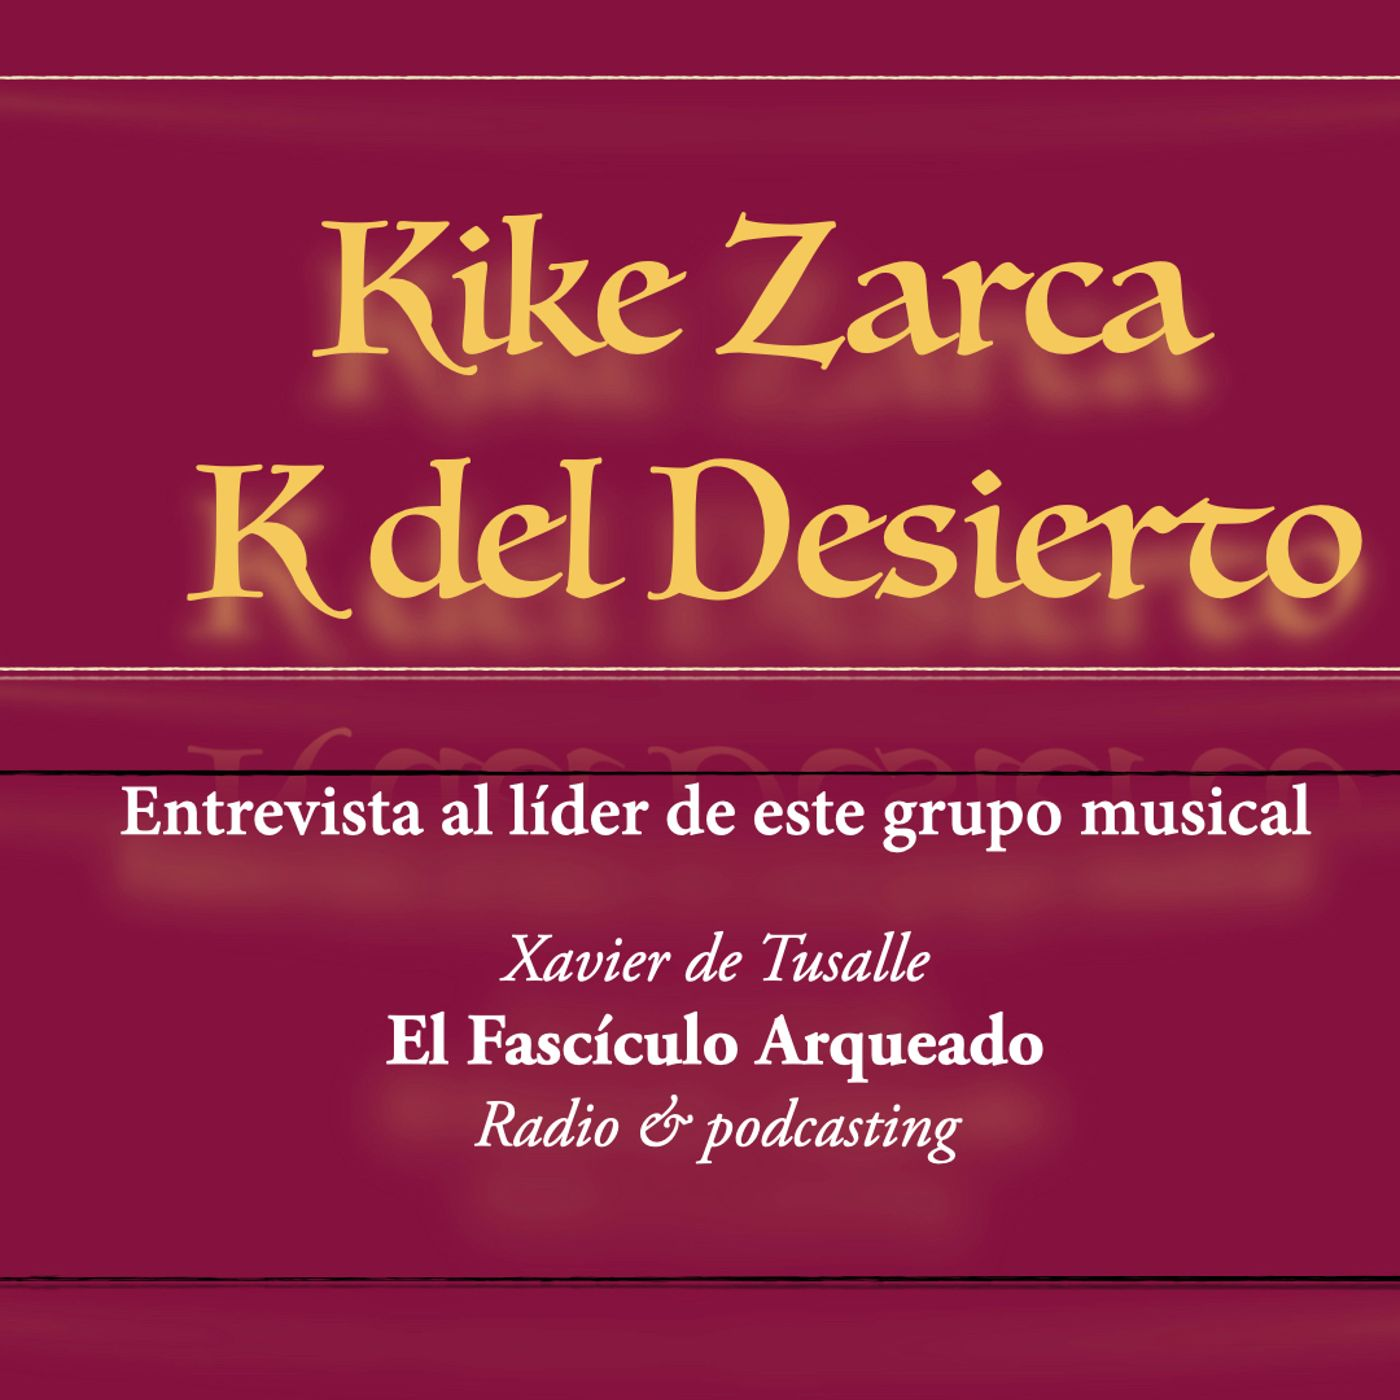 Entrevista a Kike Zarca, líder del grupo musical K del Desierto